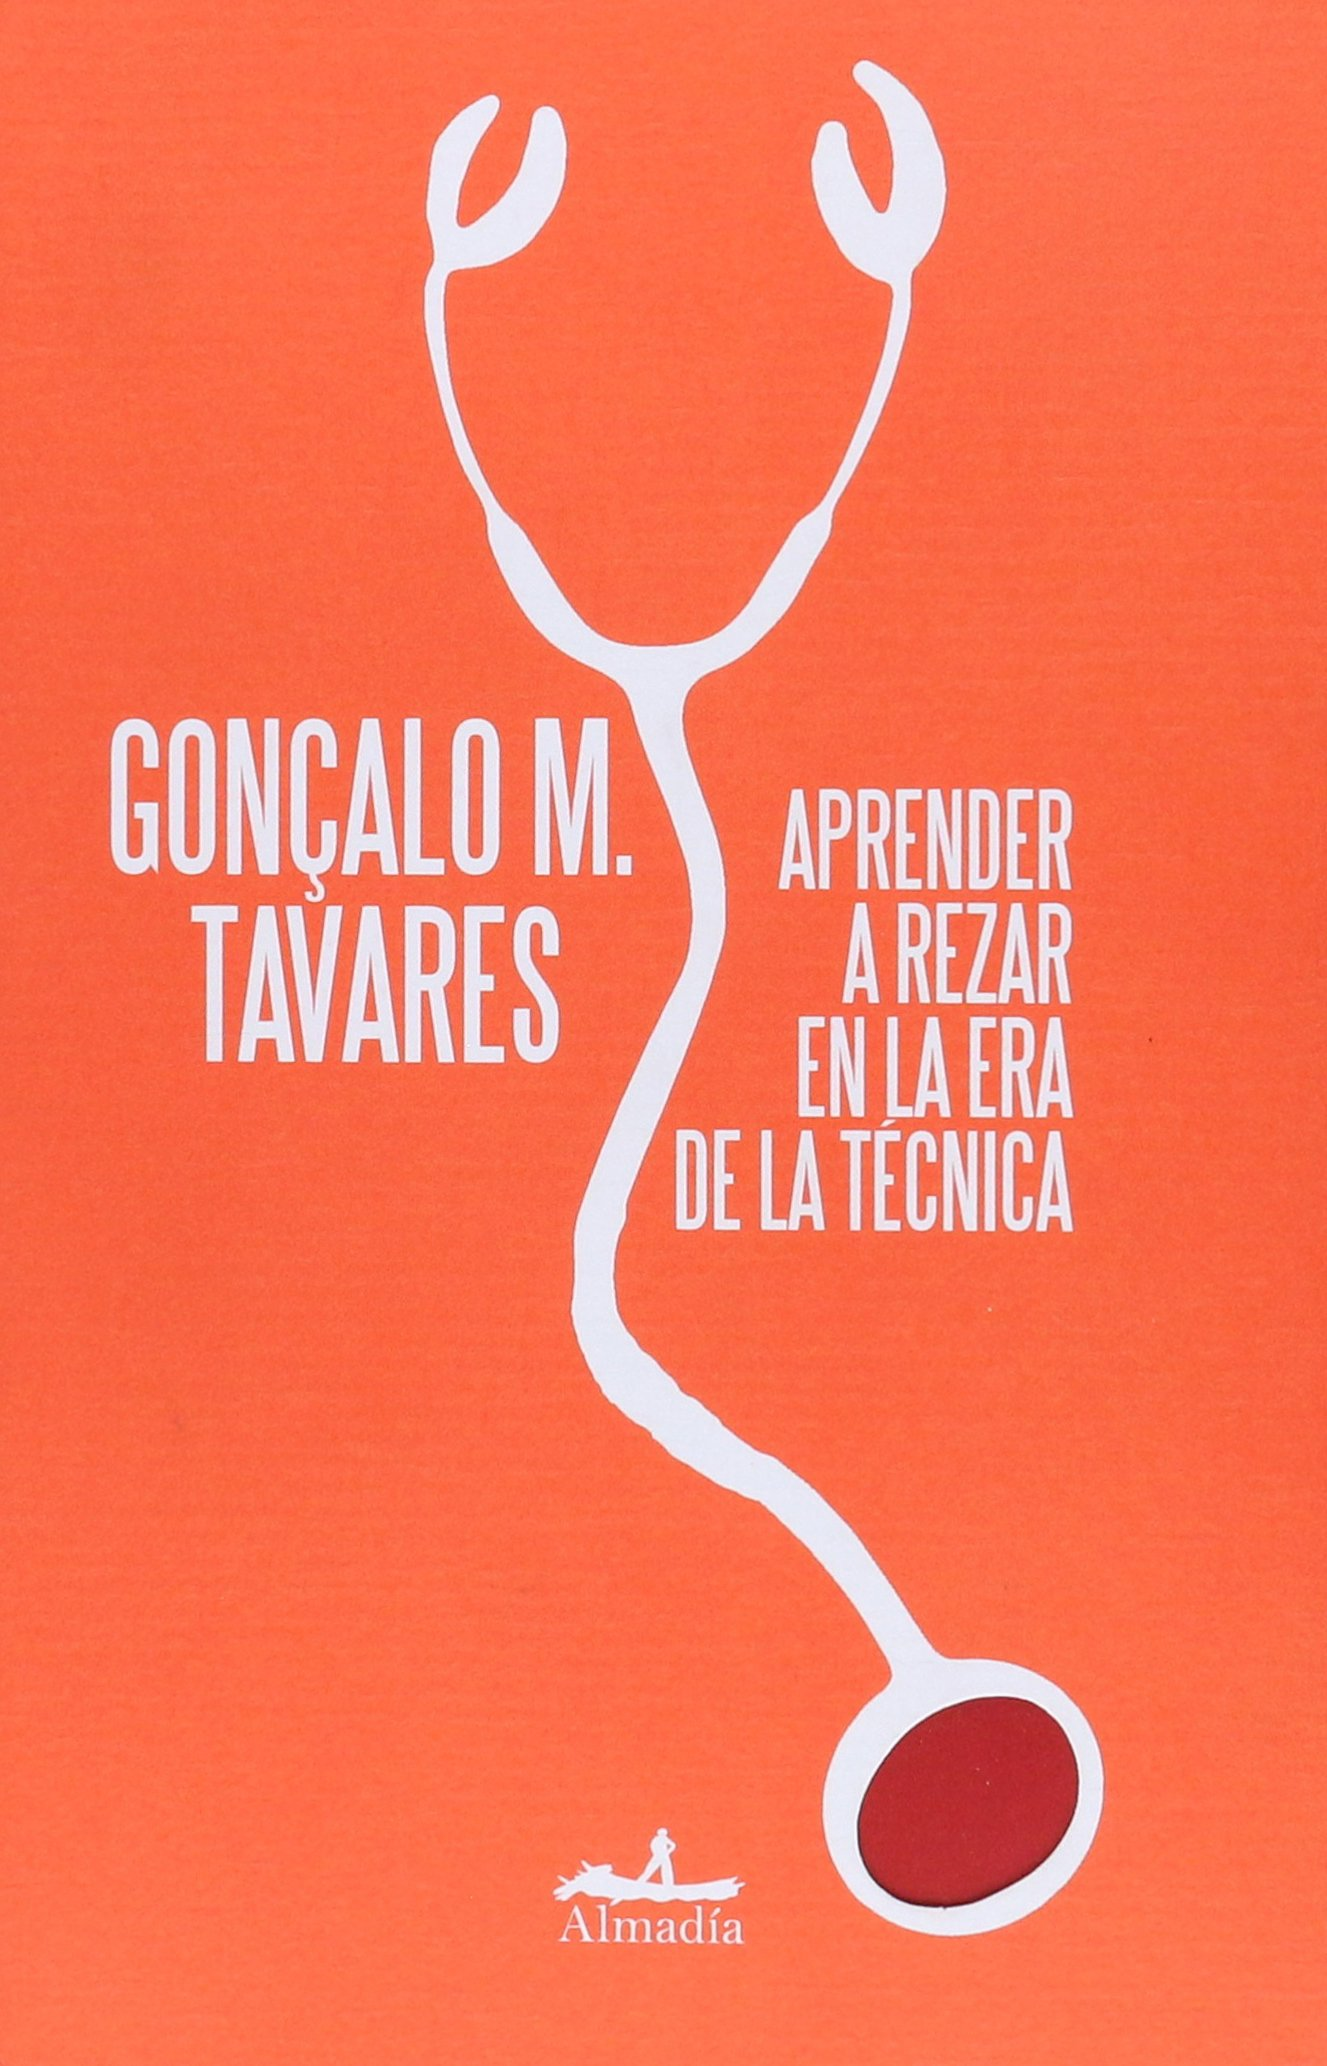 Aprender a rezar en la era de la técnica (Spanish) Paperback – 2013